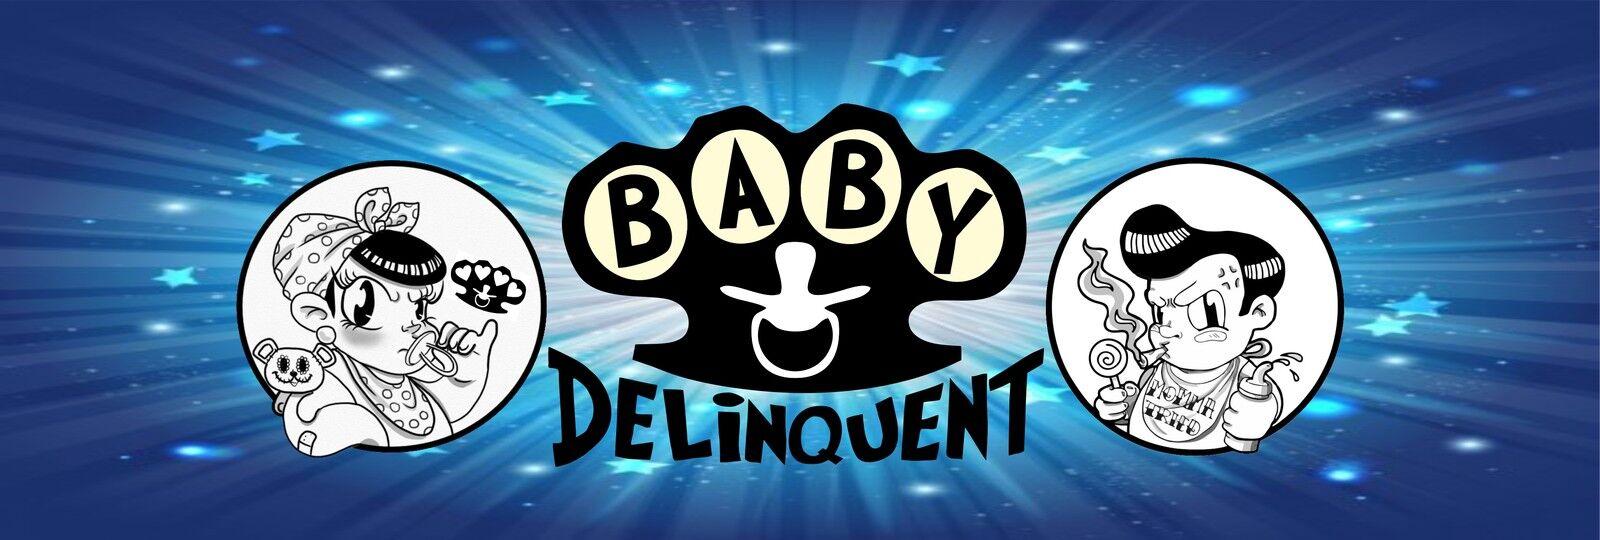 Baby Delinquent